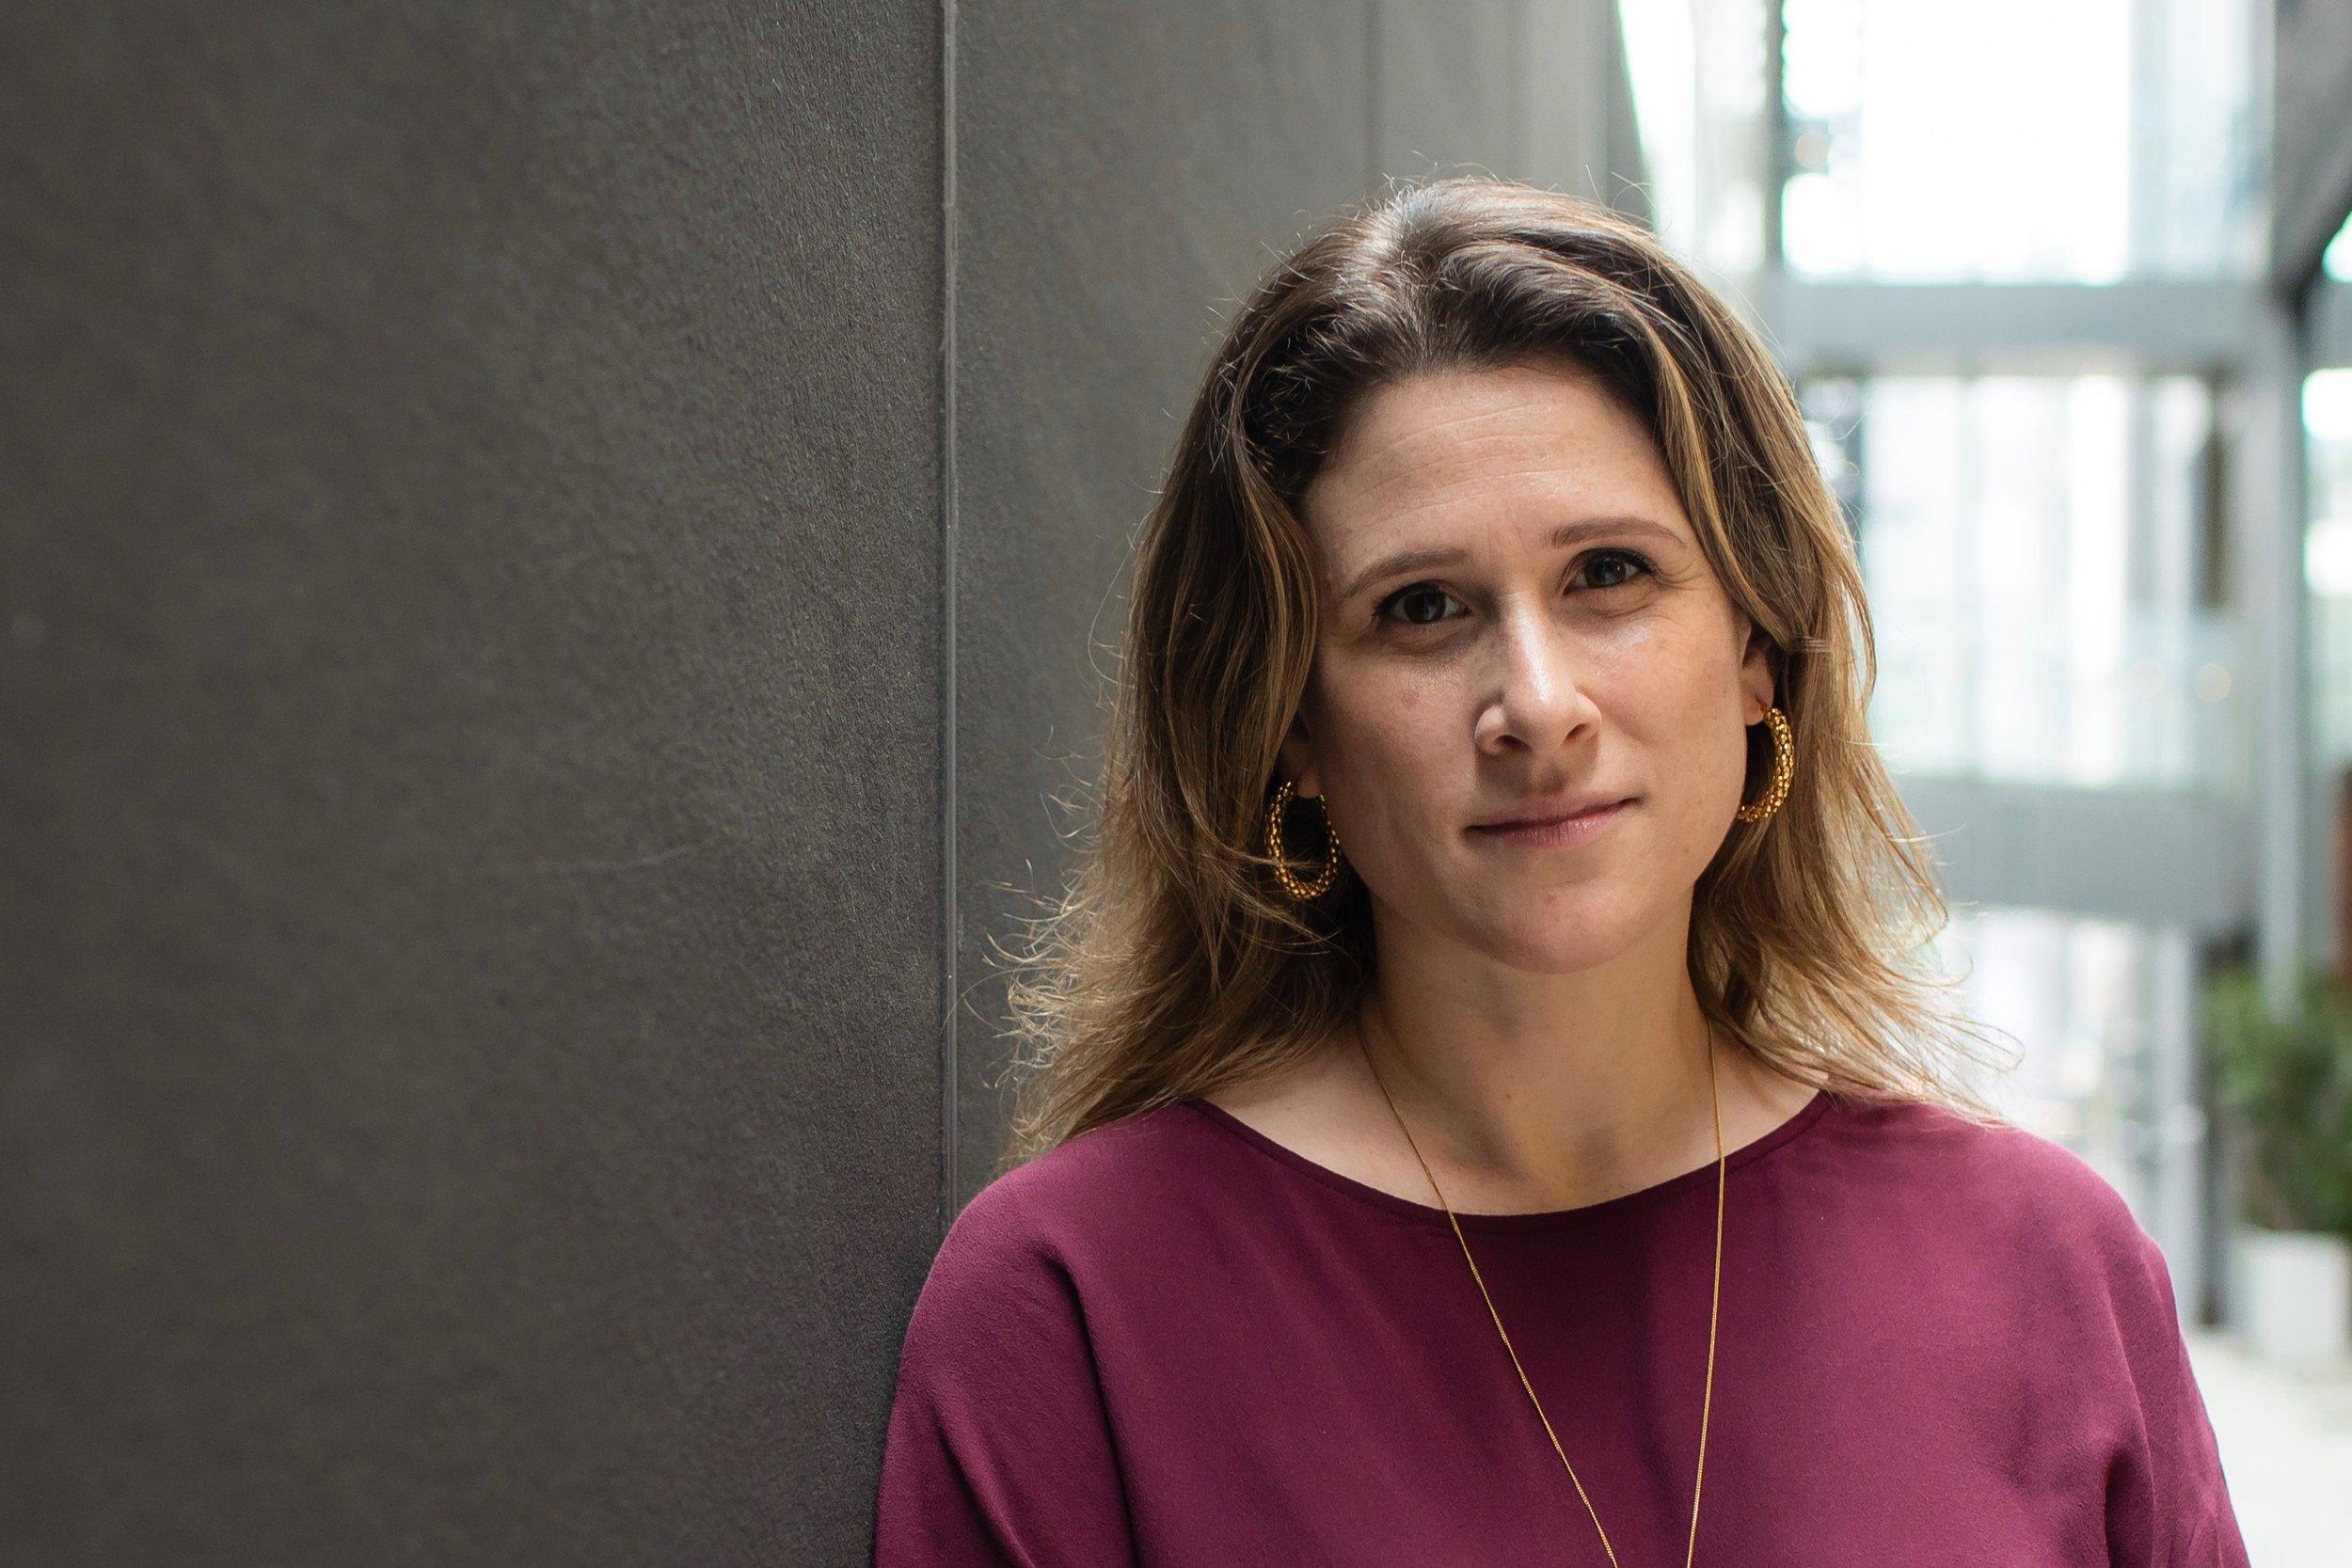 Katherine Fallah, University of Technology Sydney